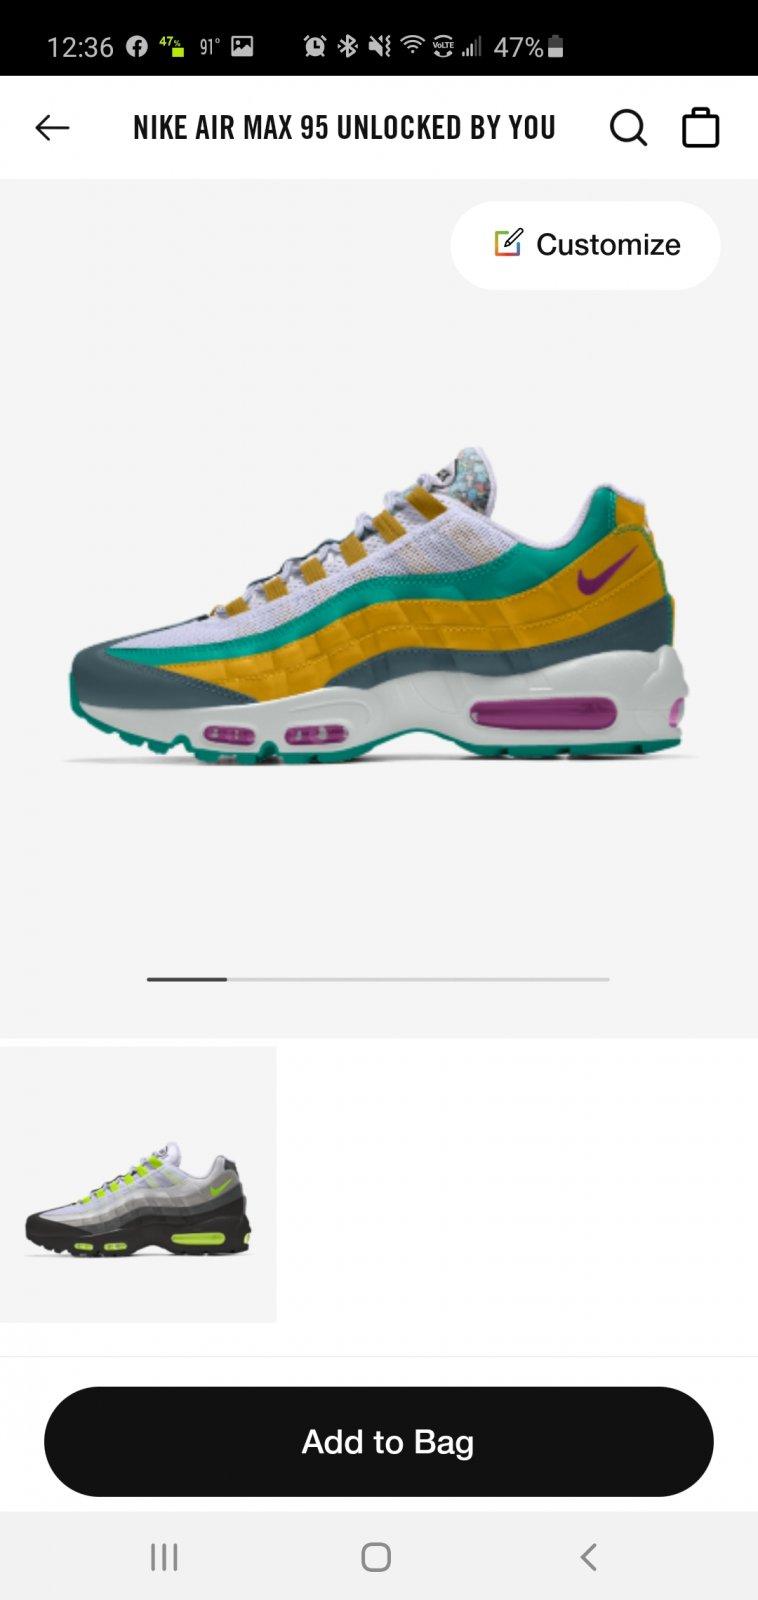 Screenshot_20200706-123609_Nike.jpg